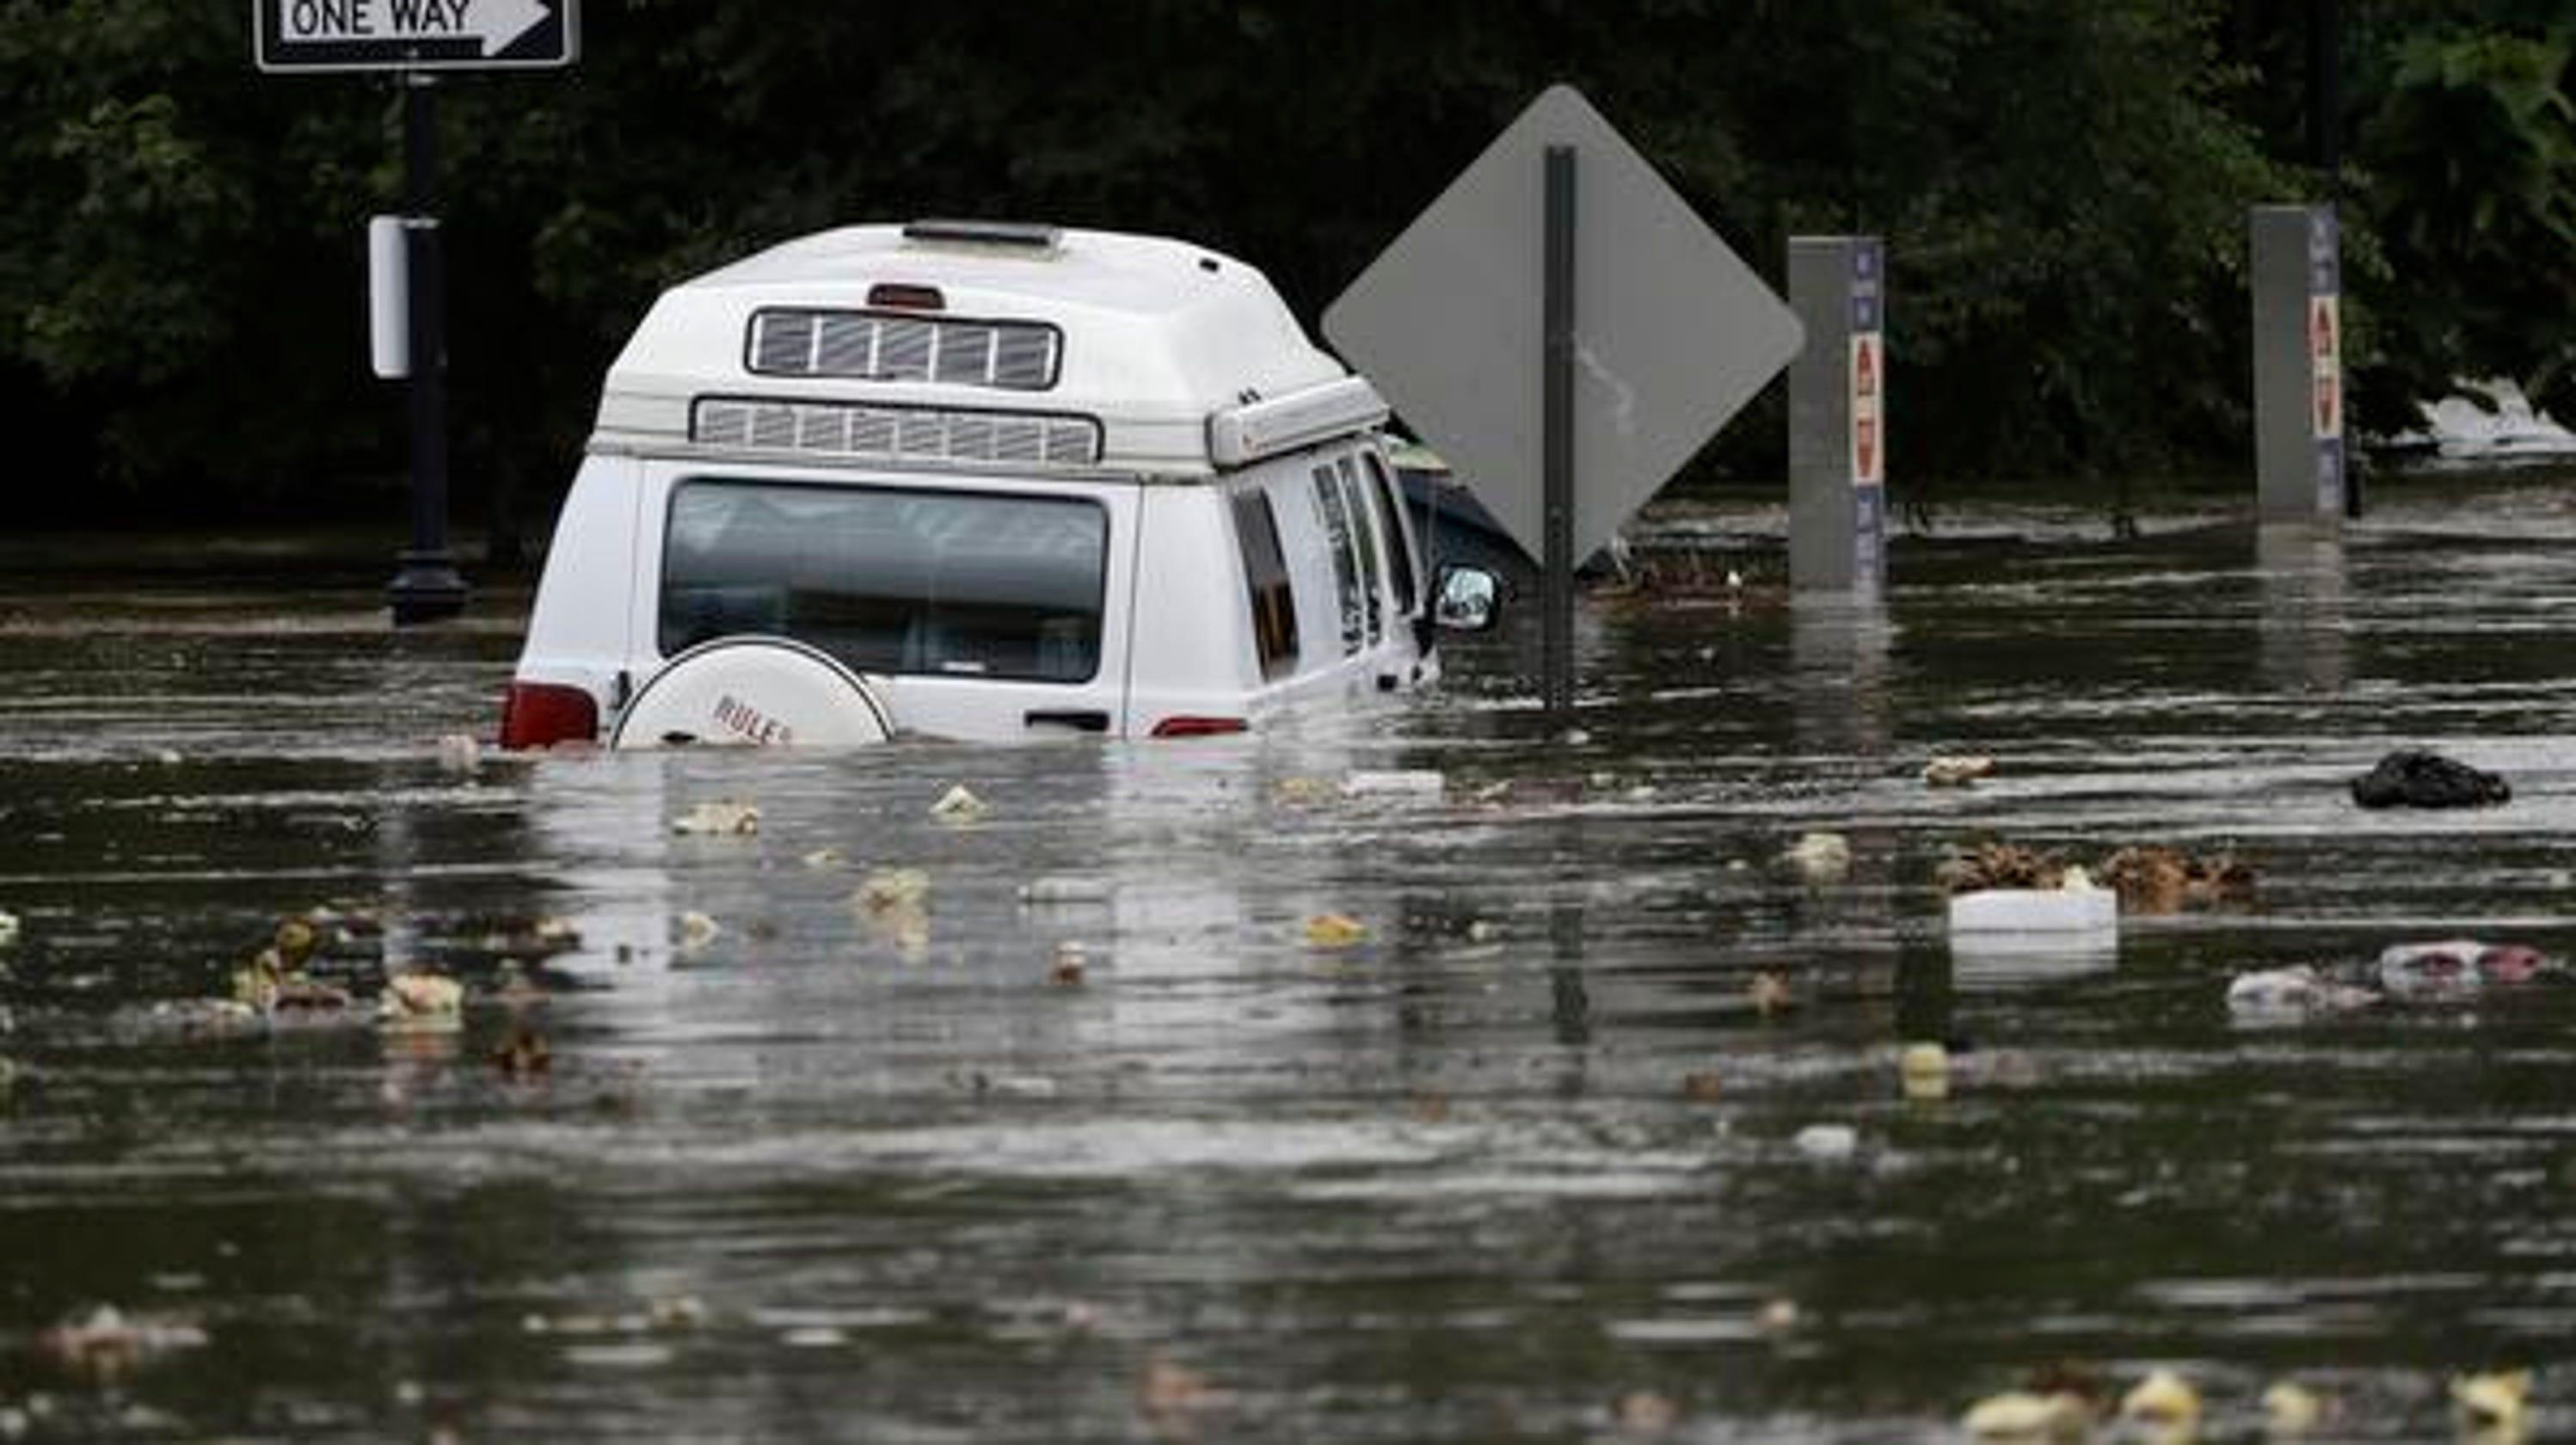 Pennsylvania flooding: Drenching rain wreaks havoc across state